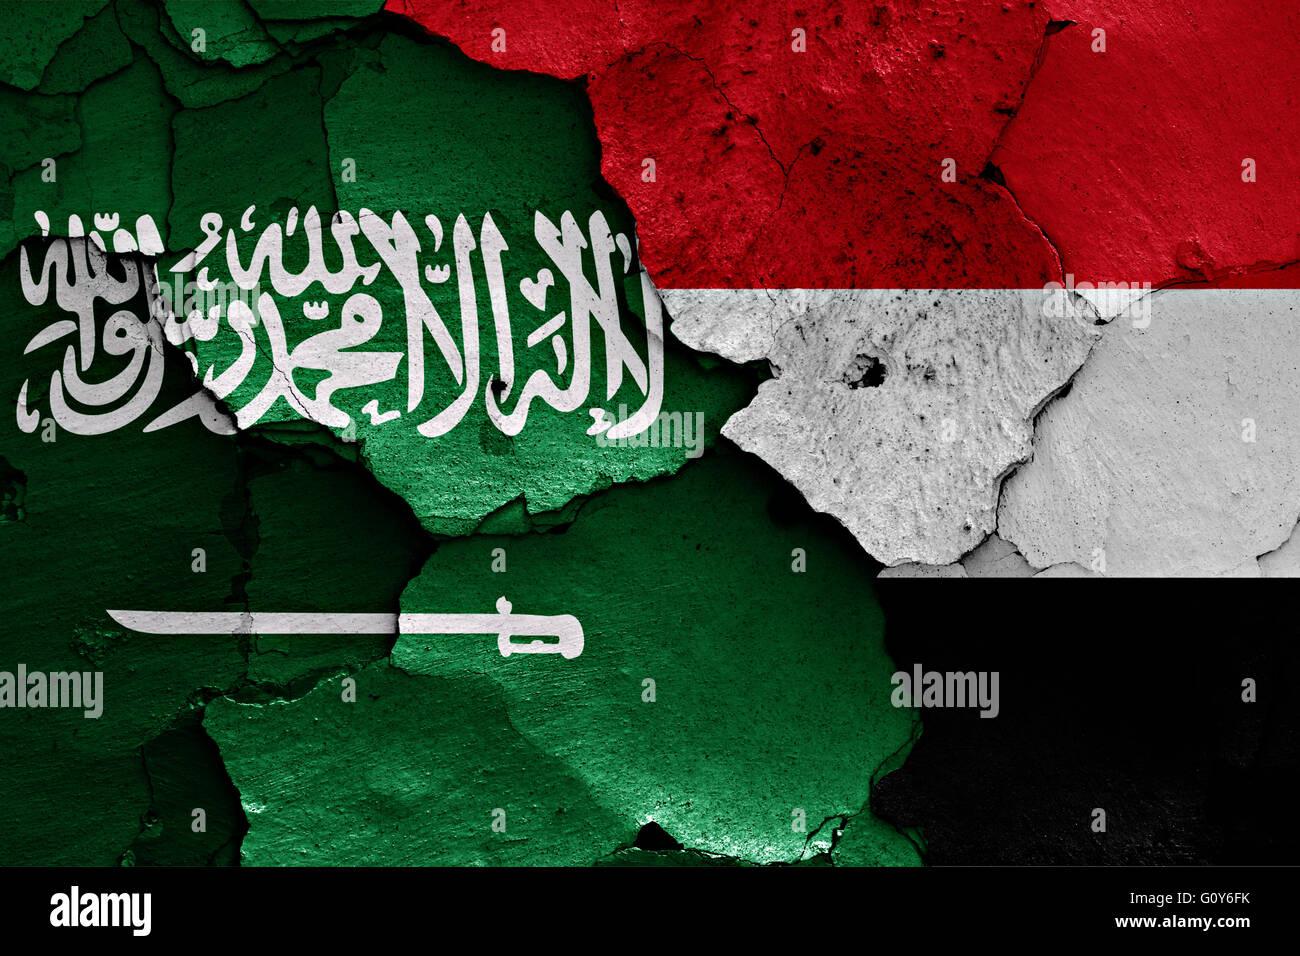 flags of Saudi Arabia and Yemen painted on cracked wall - Stock Image